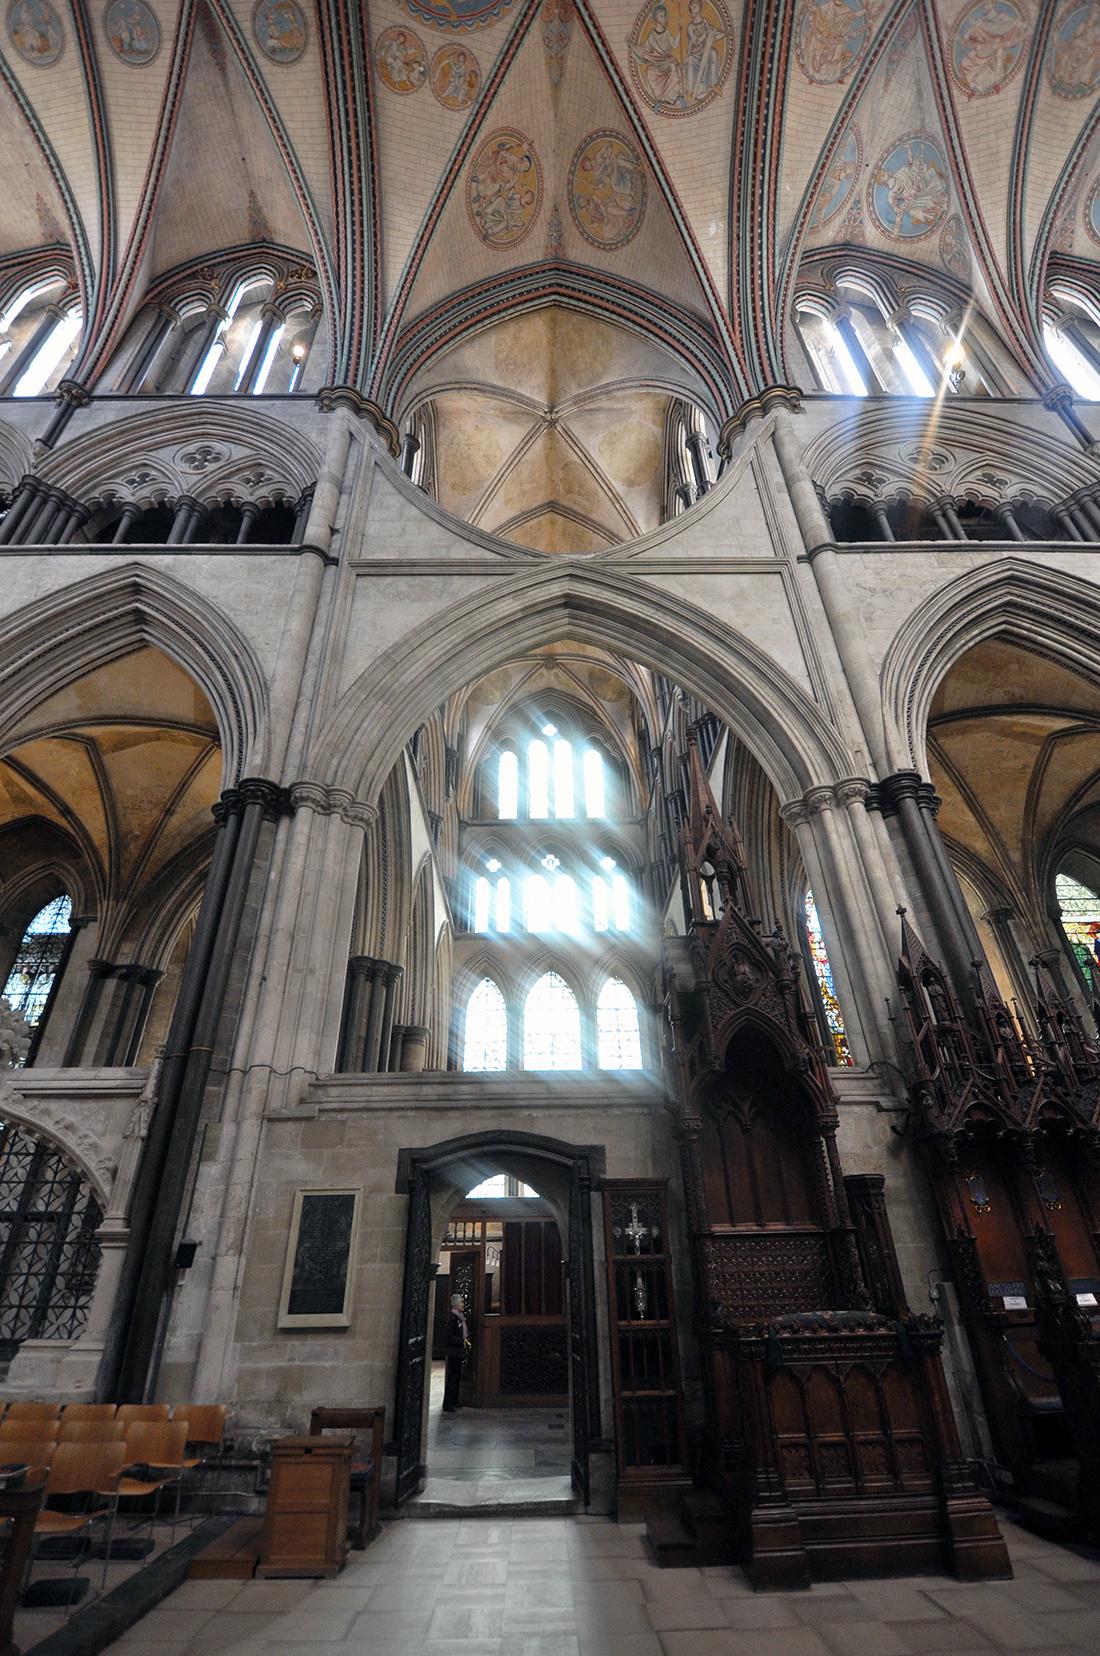 Salisbury Cathedral transept